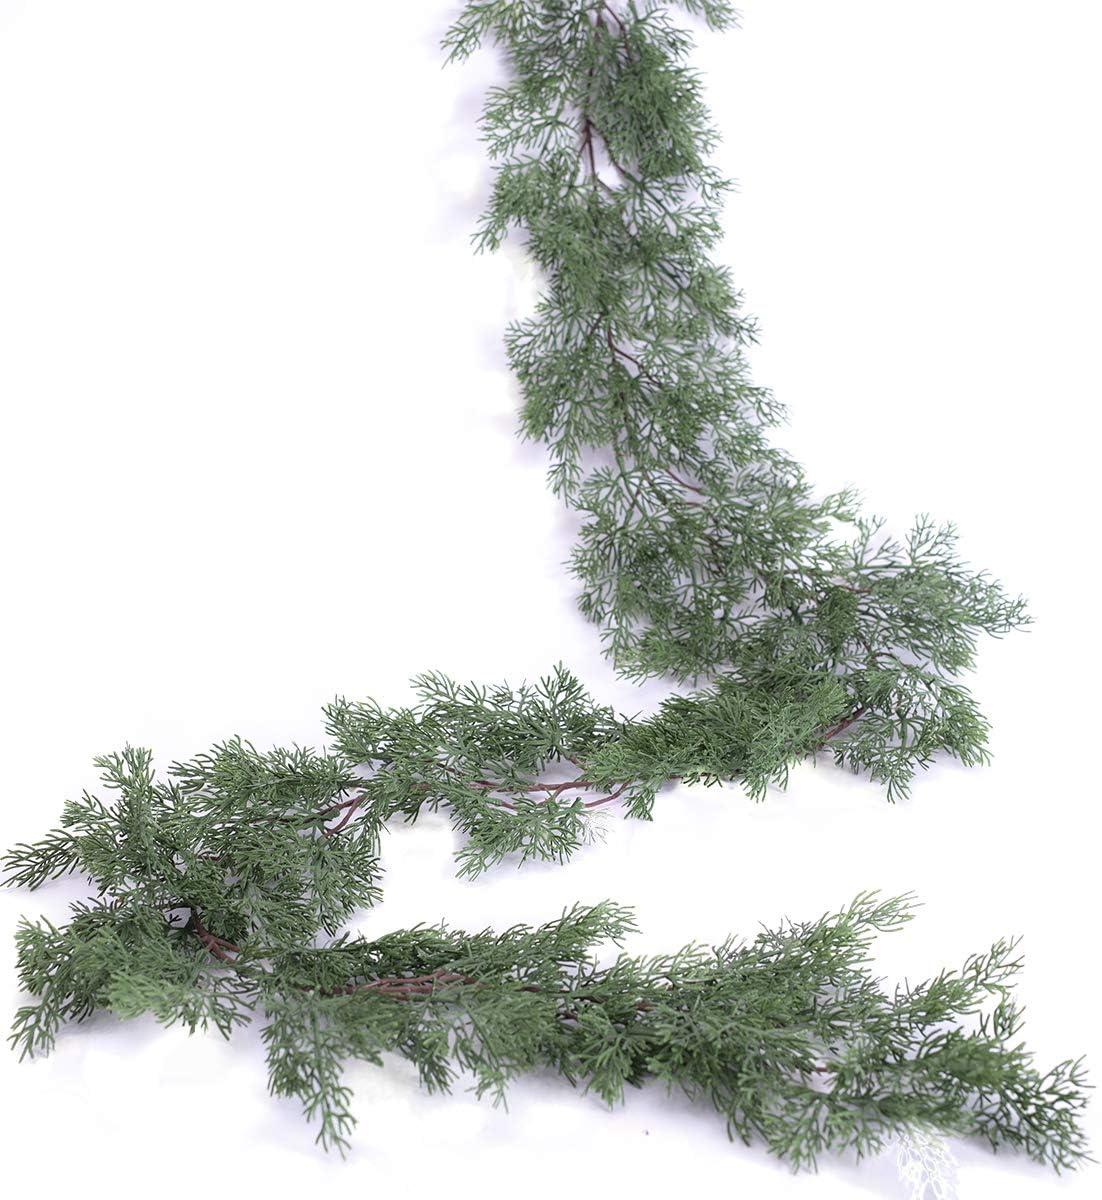 PARTY JOY Seasonal Artificial Christmas Garland Pine Cypress Greenery Garland Holiday Outdoor Winter Decor-5.9ft